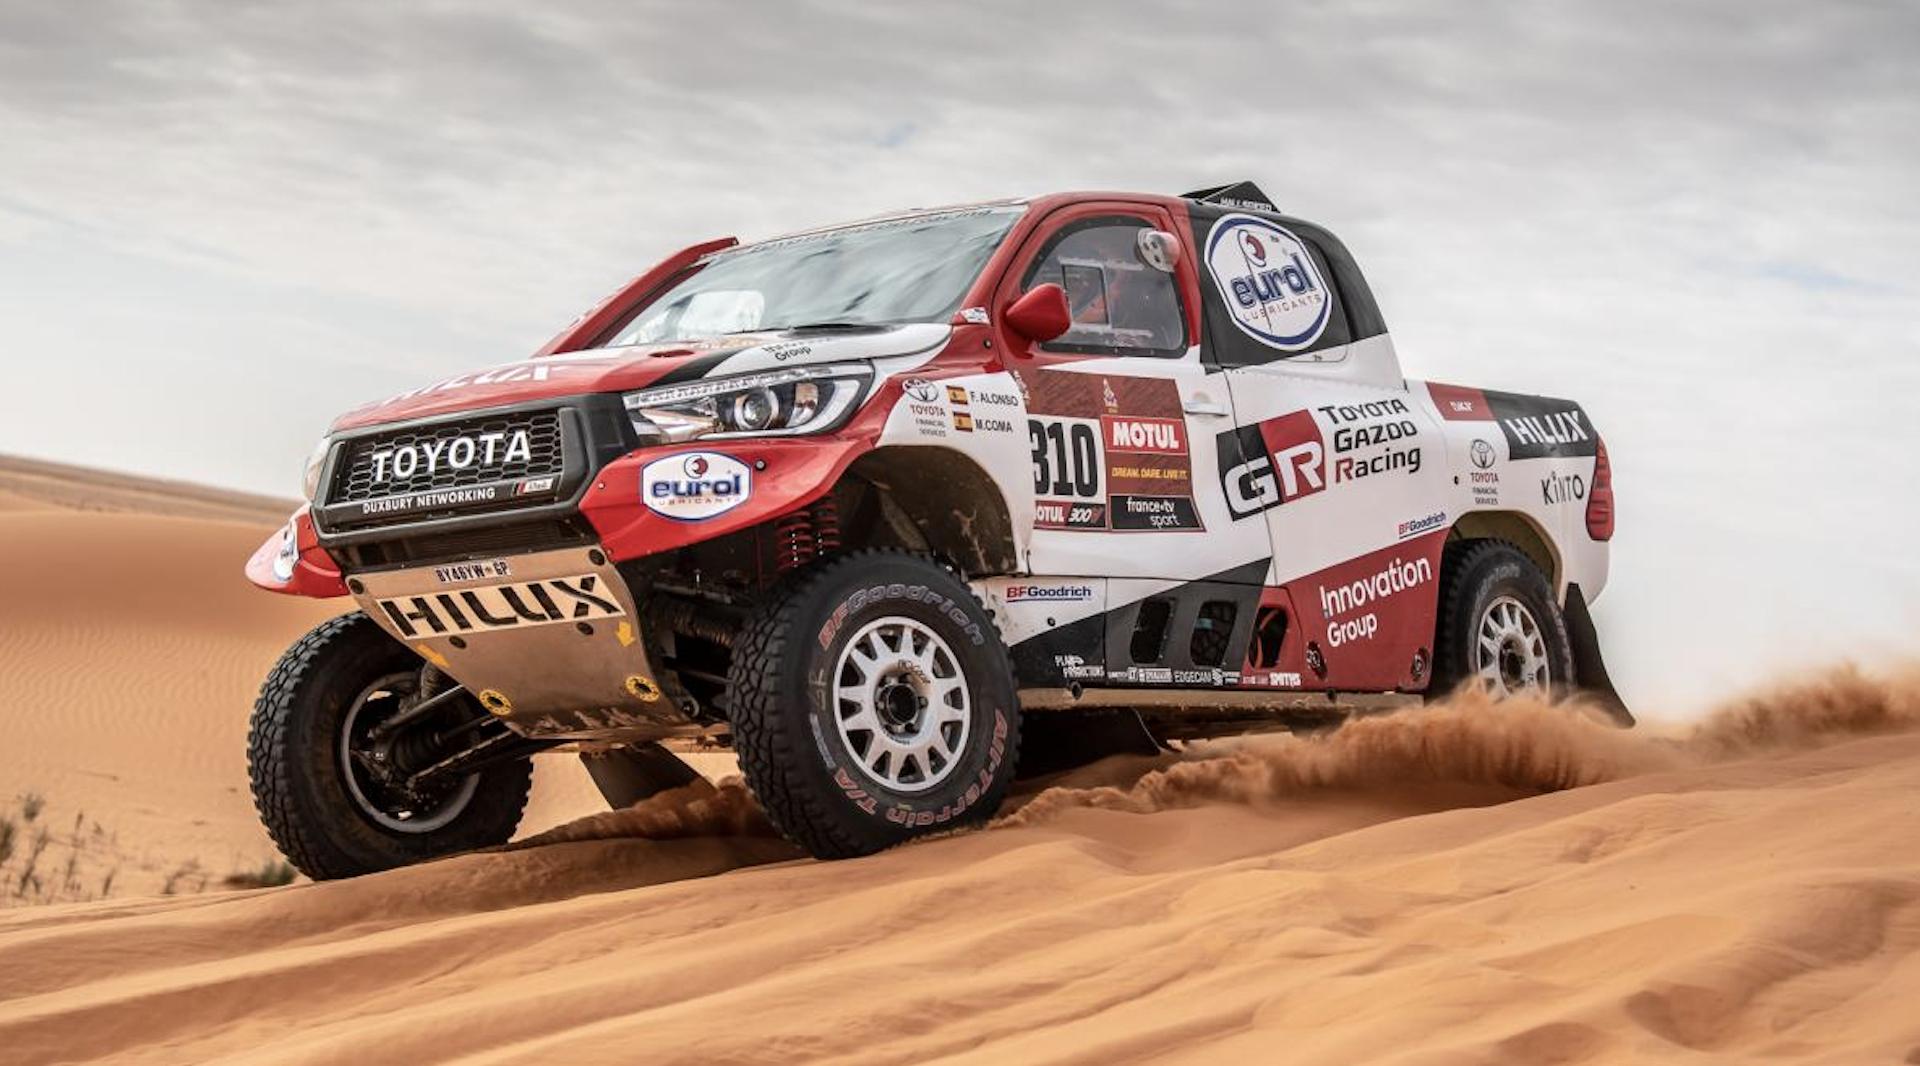 Fernando Alonso at the 2020 Dakar Rally